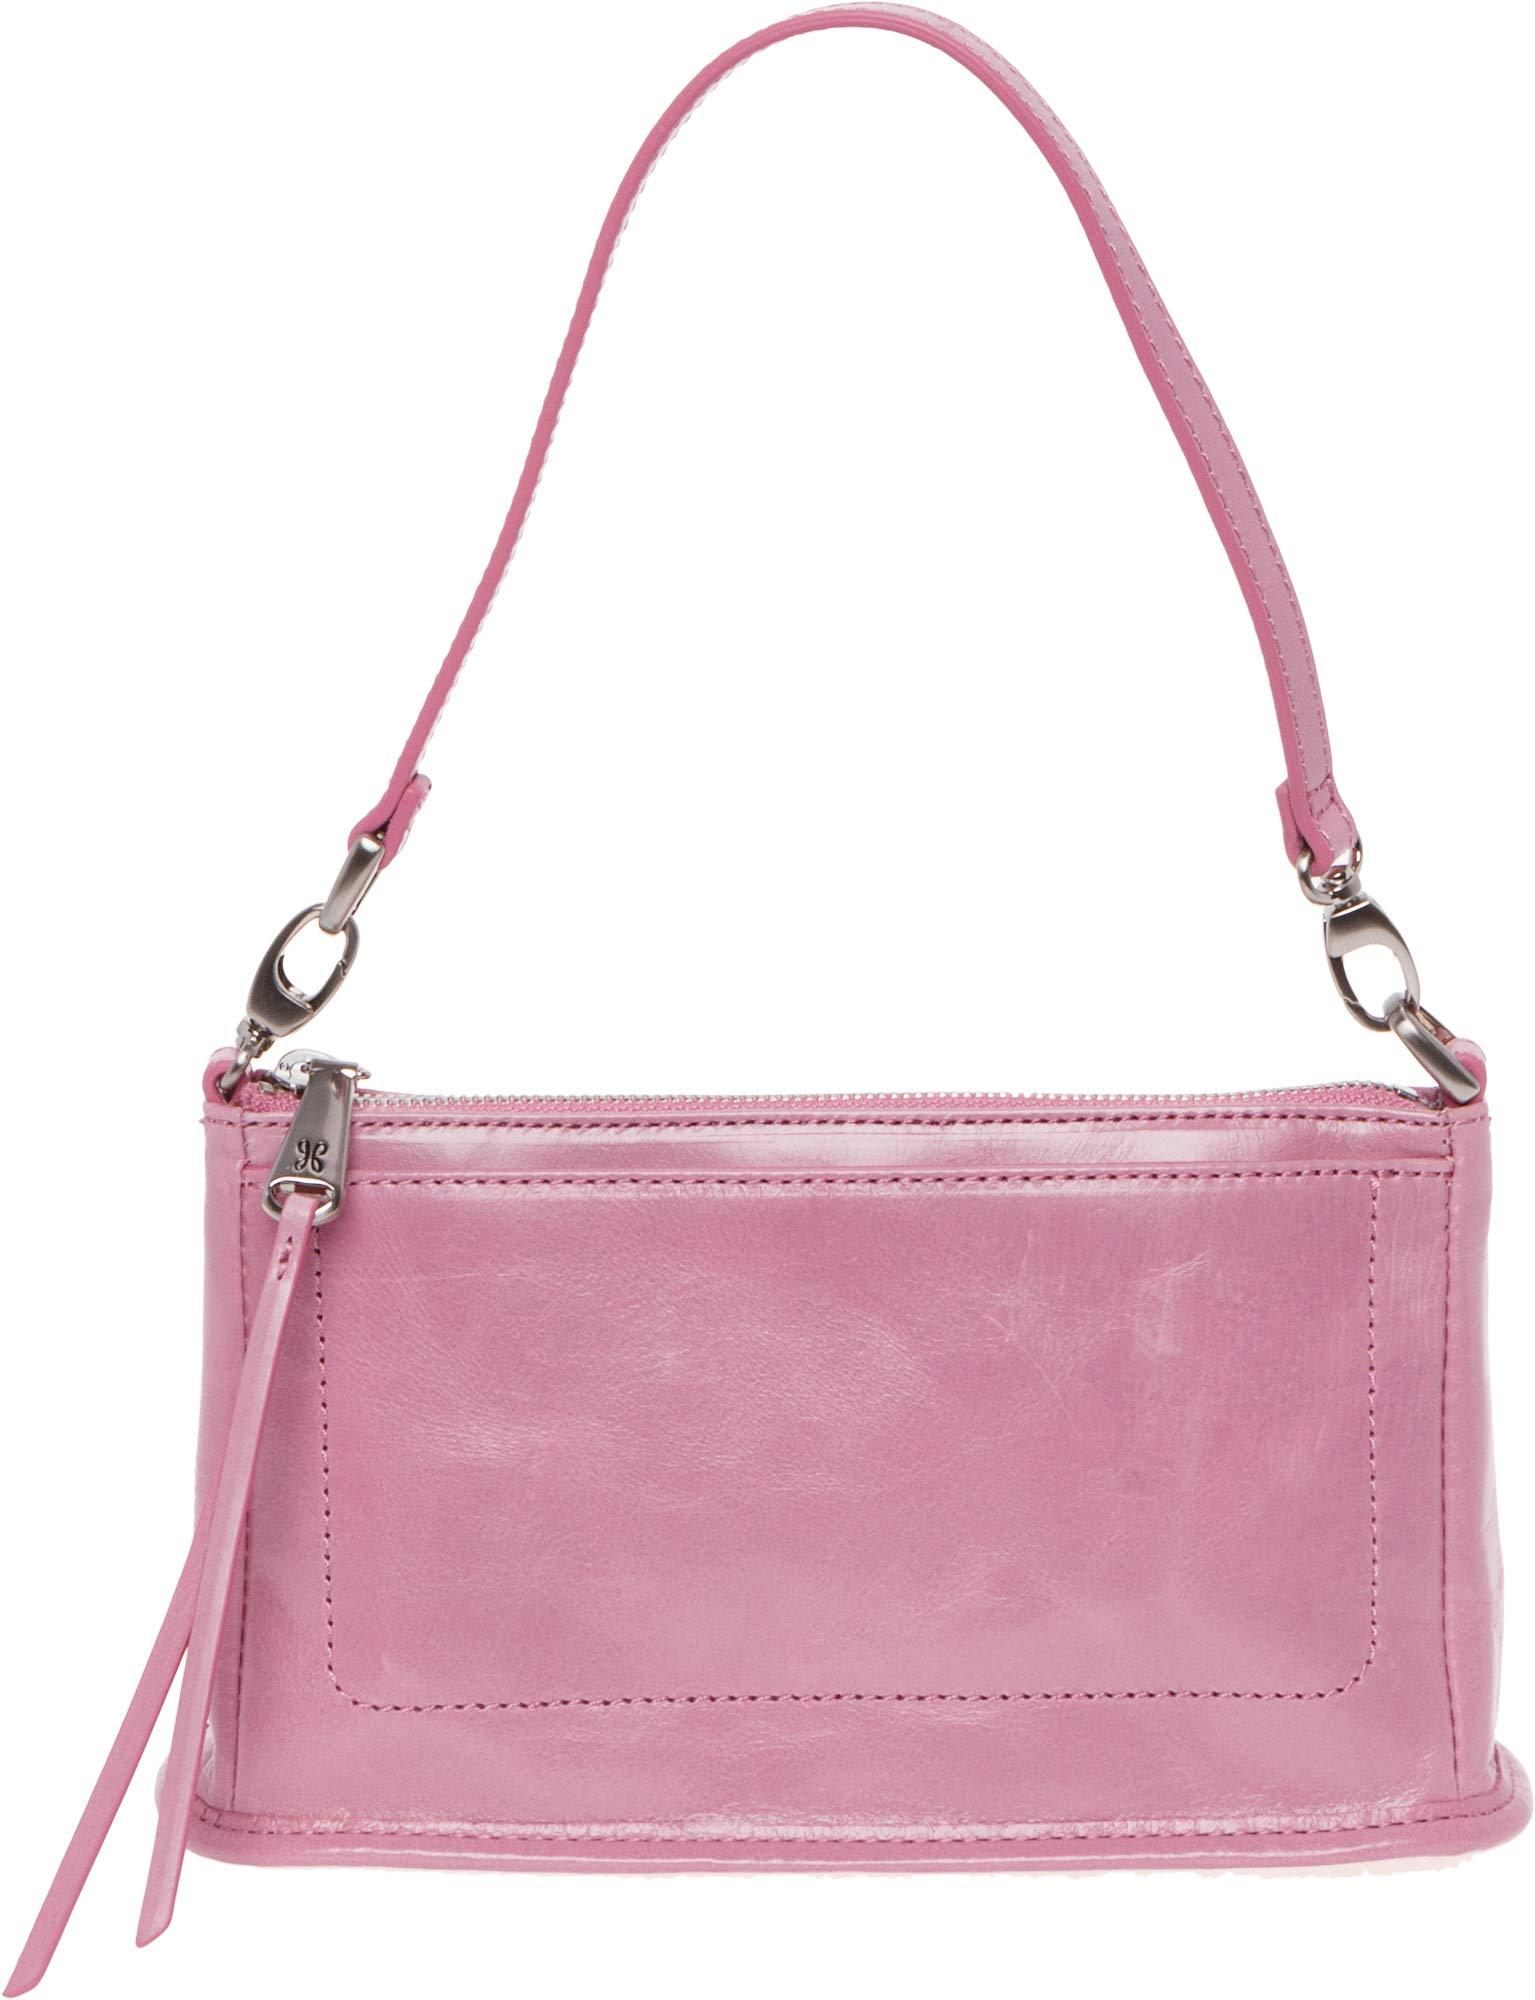 Hobo Women's Vintage Cadence Convertible Crossbody Bag (Lilac)